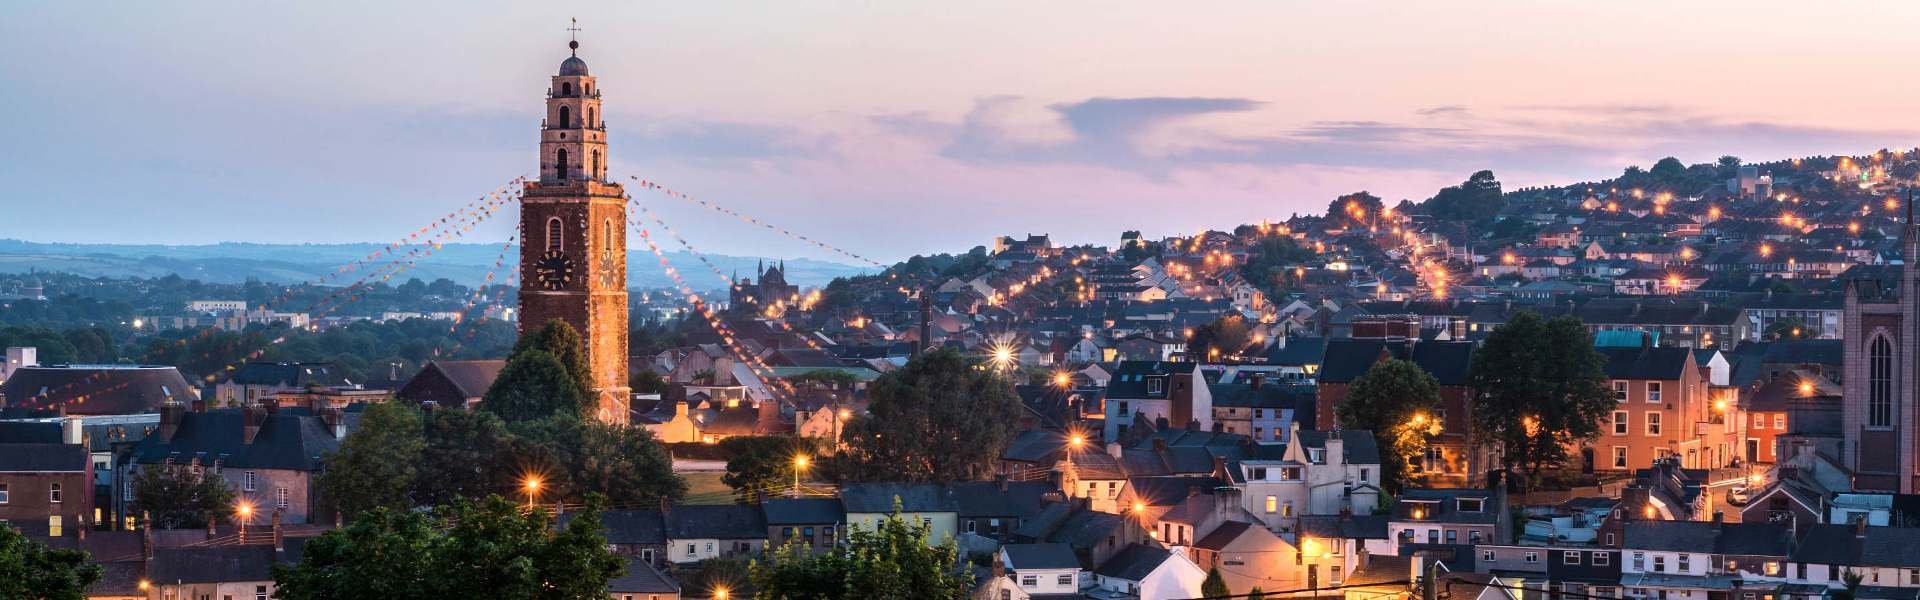 Cork Places To Visit Tourism Cork Guide